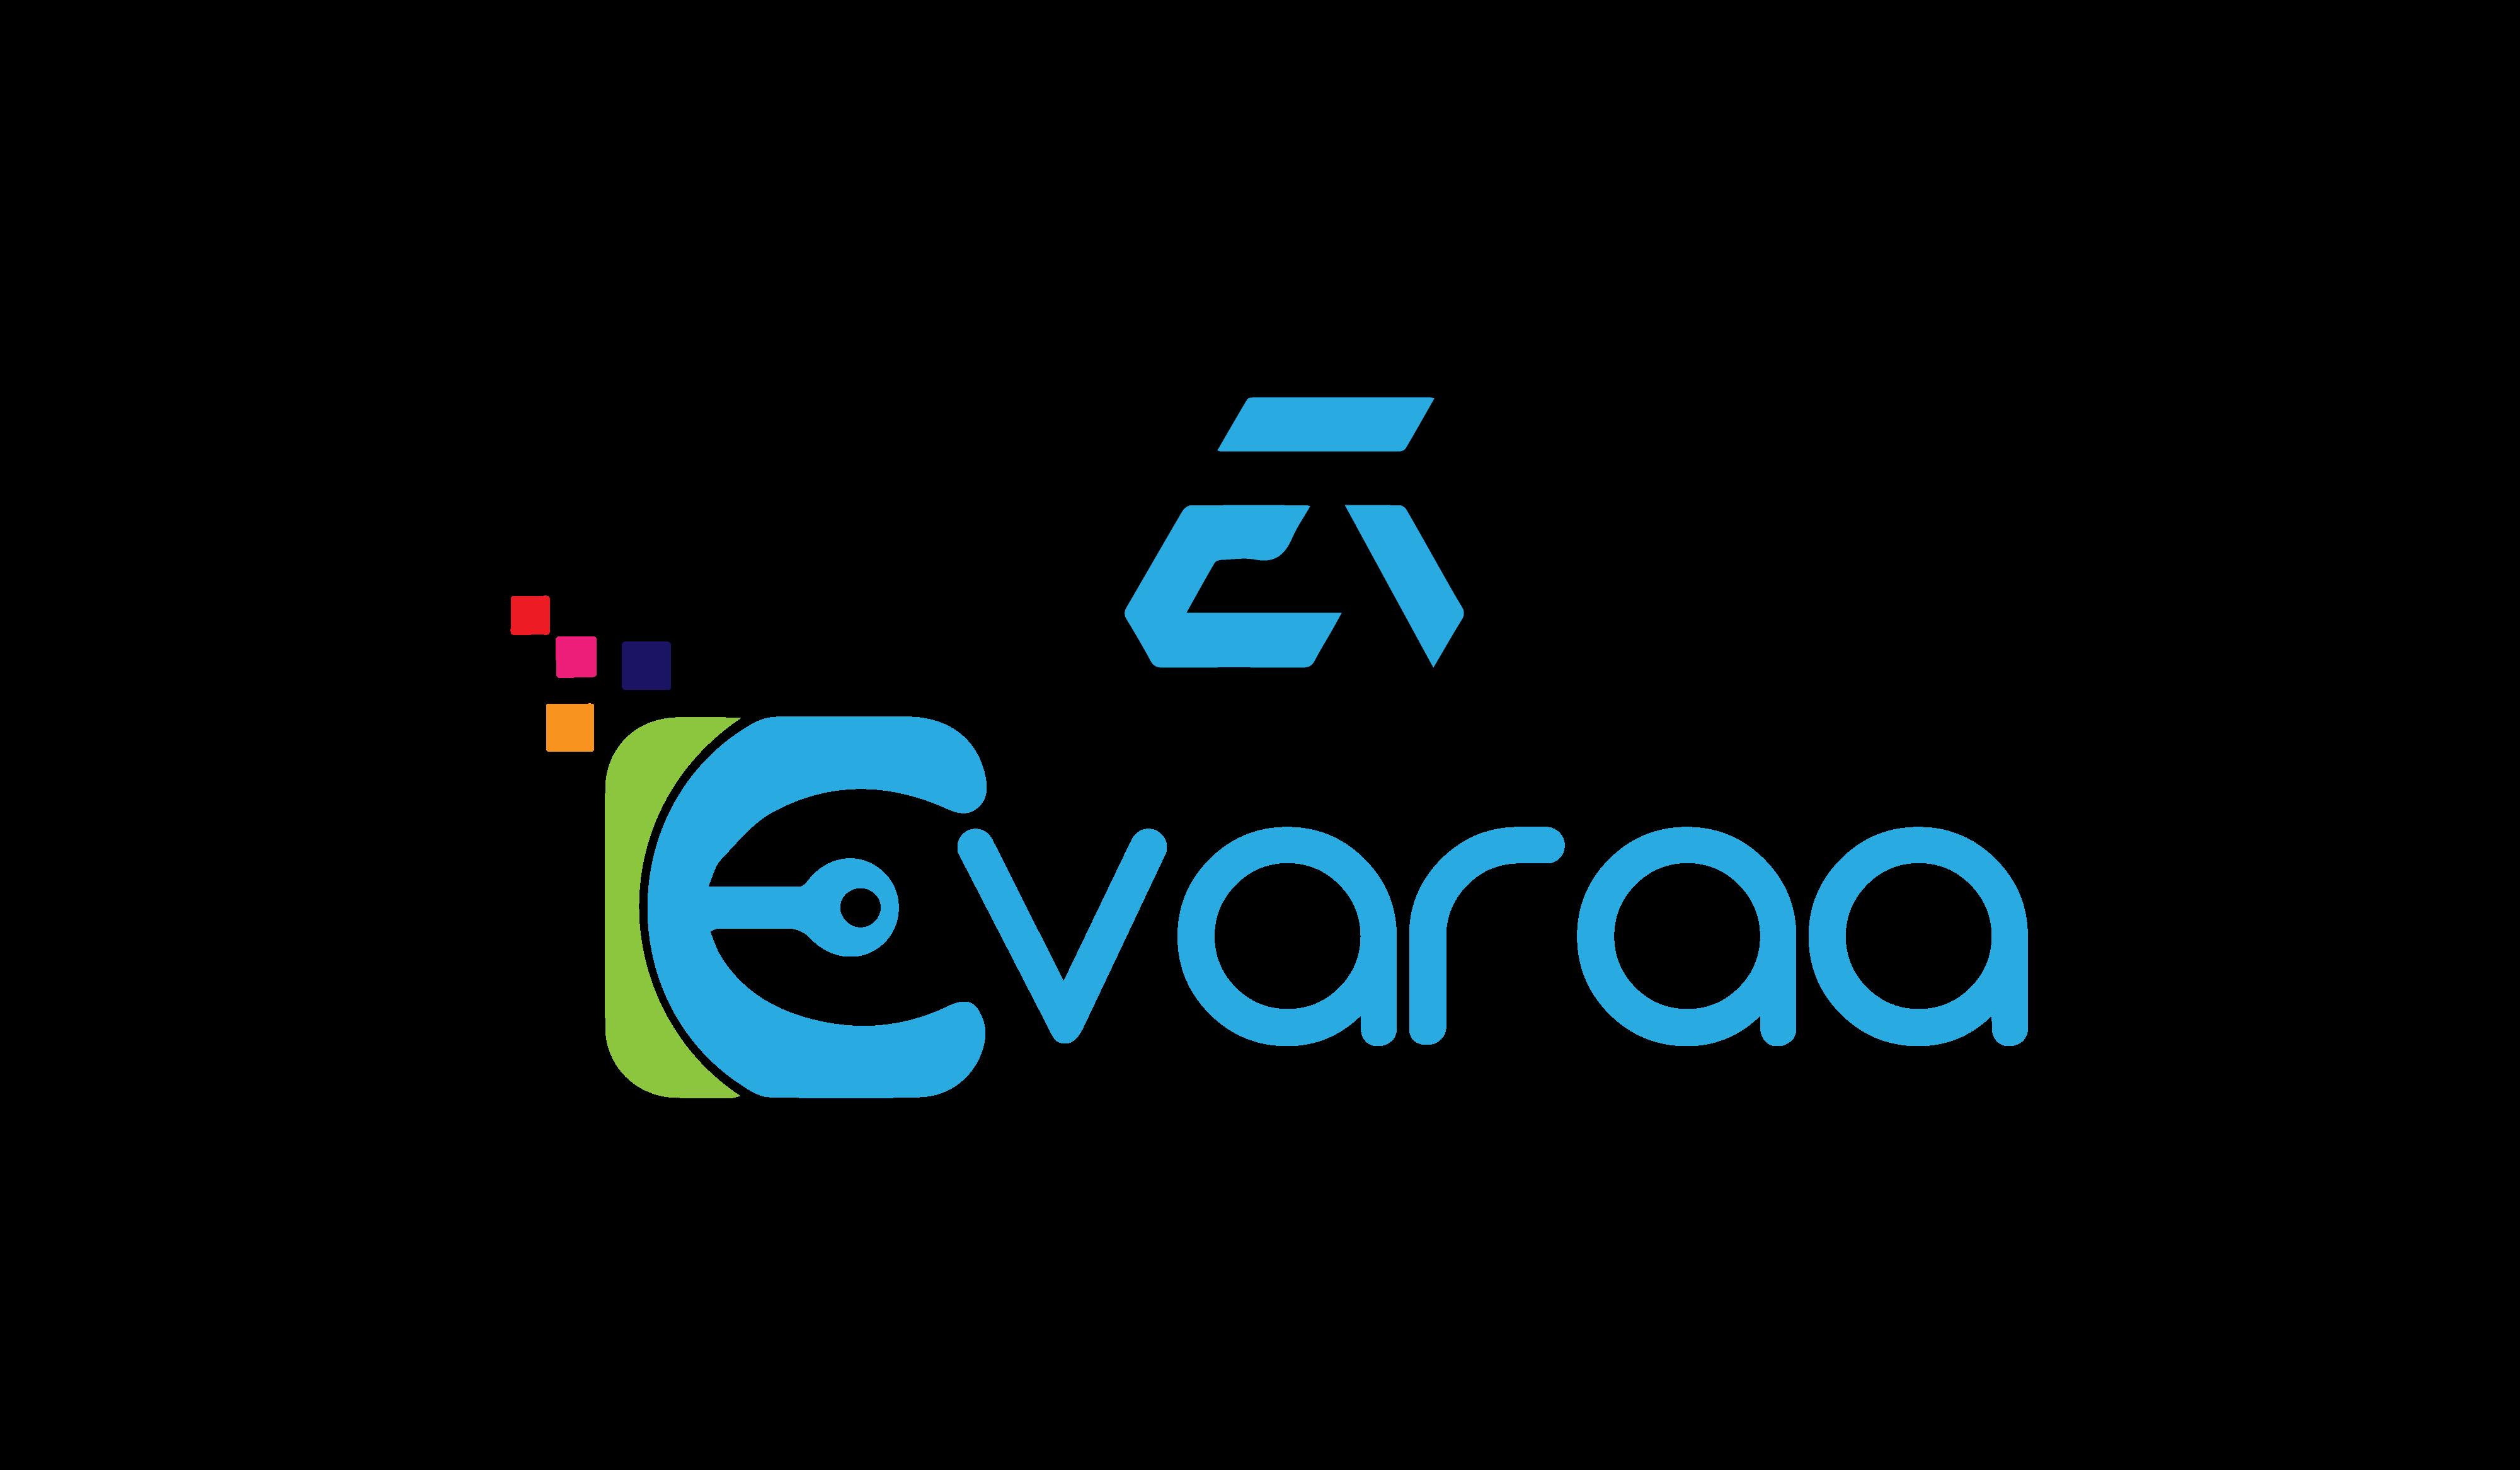 evara4-2-2 Agency 2 MP